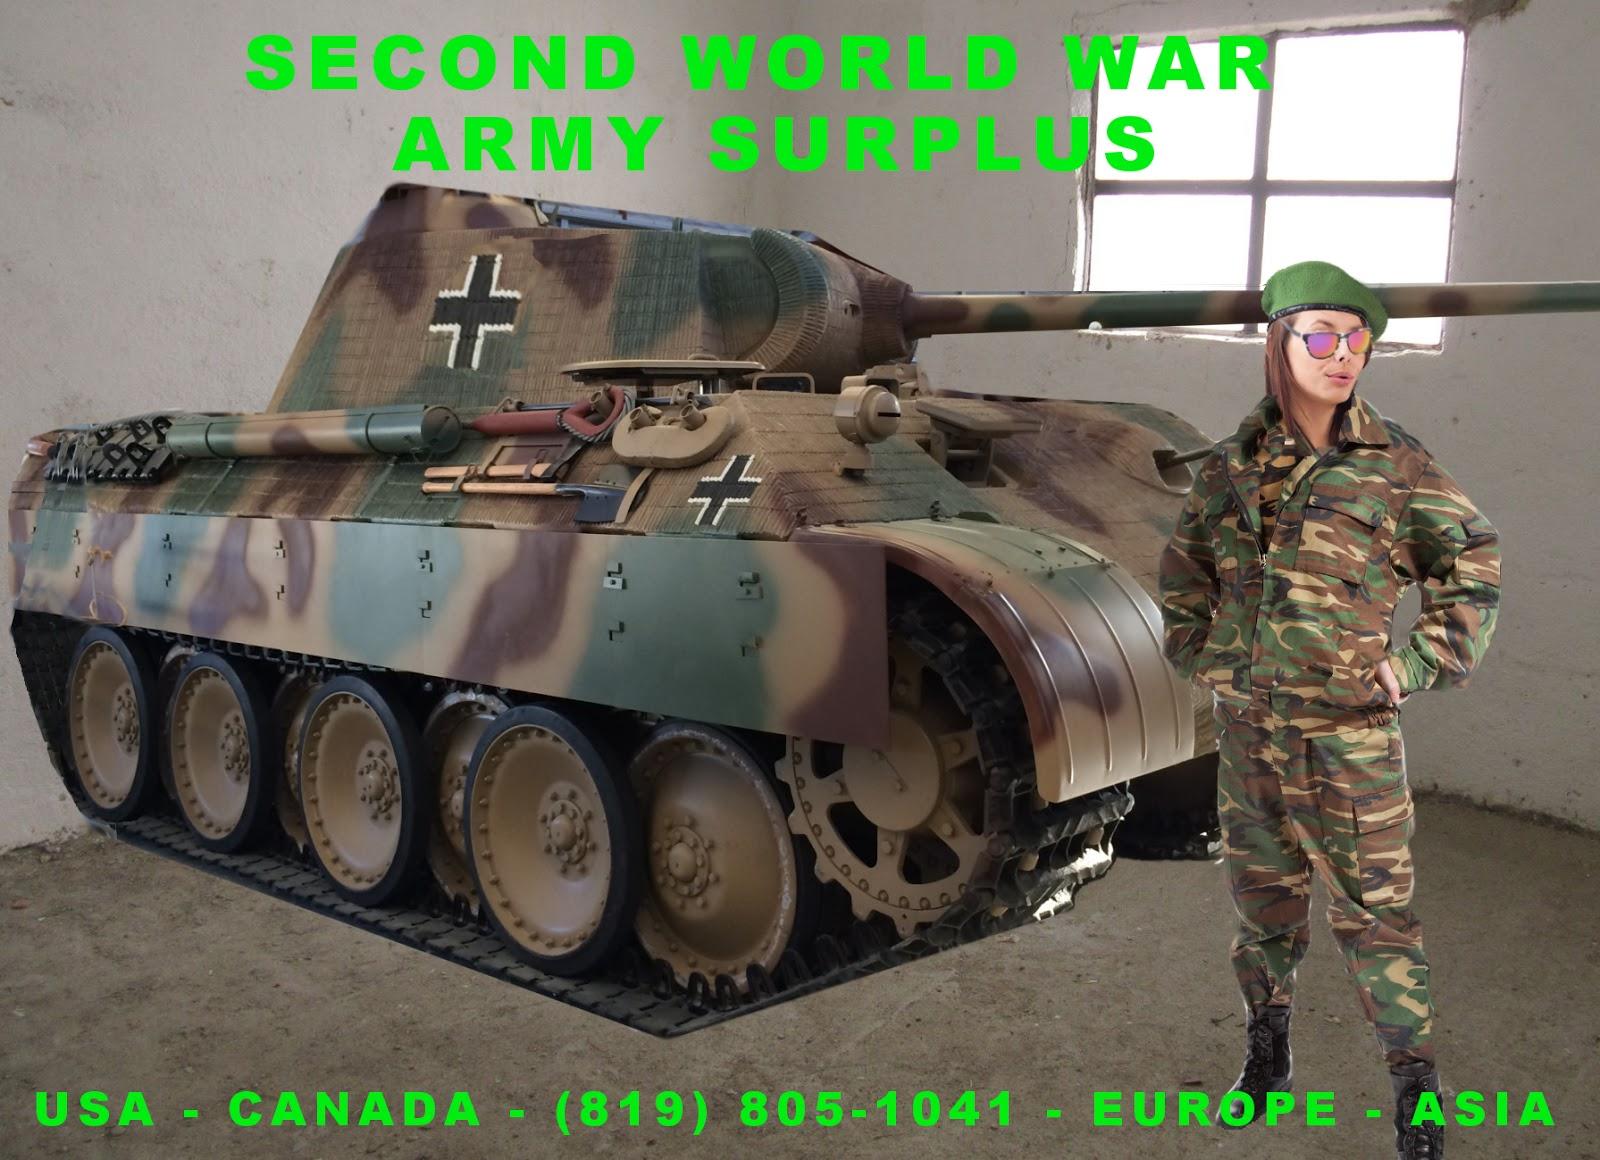 SURPLUS ARMY SECOND WORLD WAR MILITARY DEPOSIT - SURPLUS ARMÉE